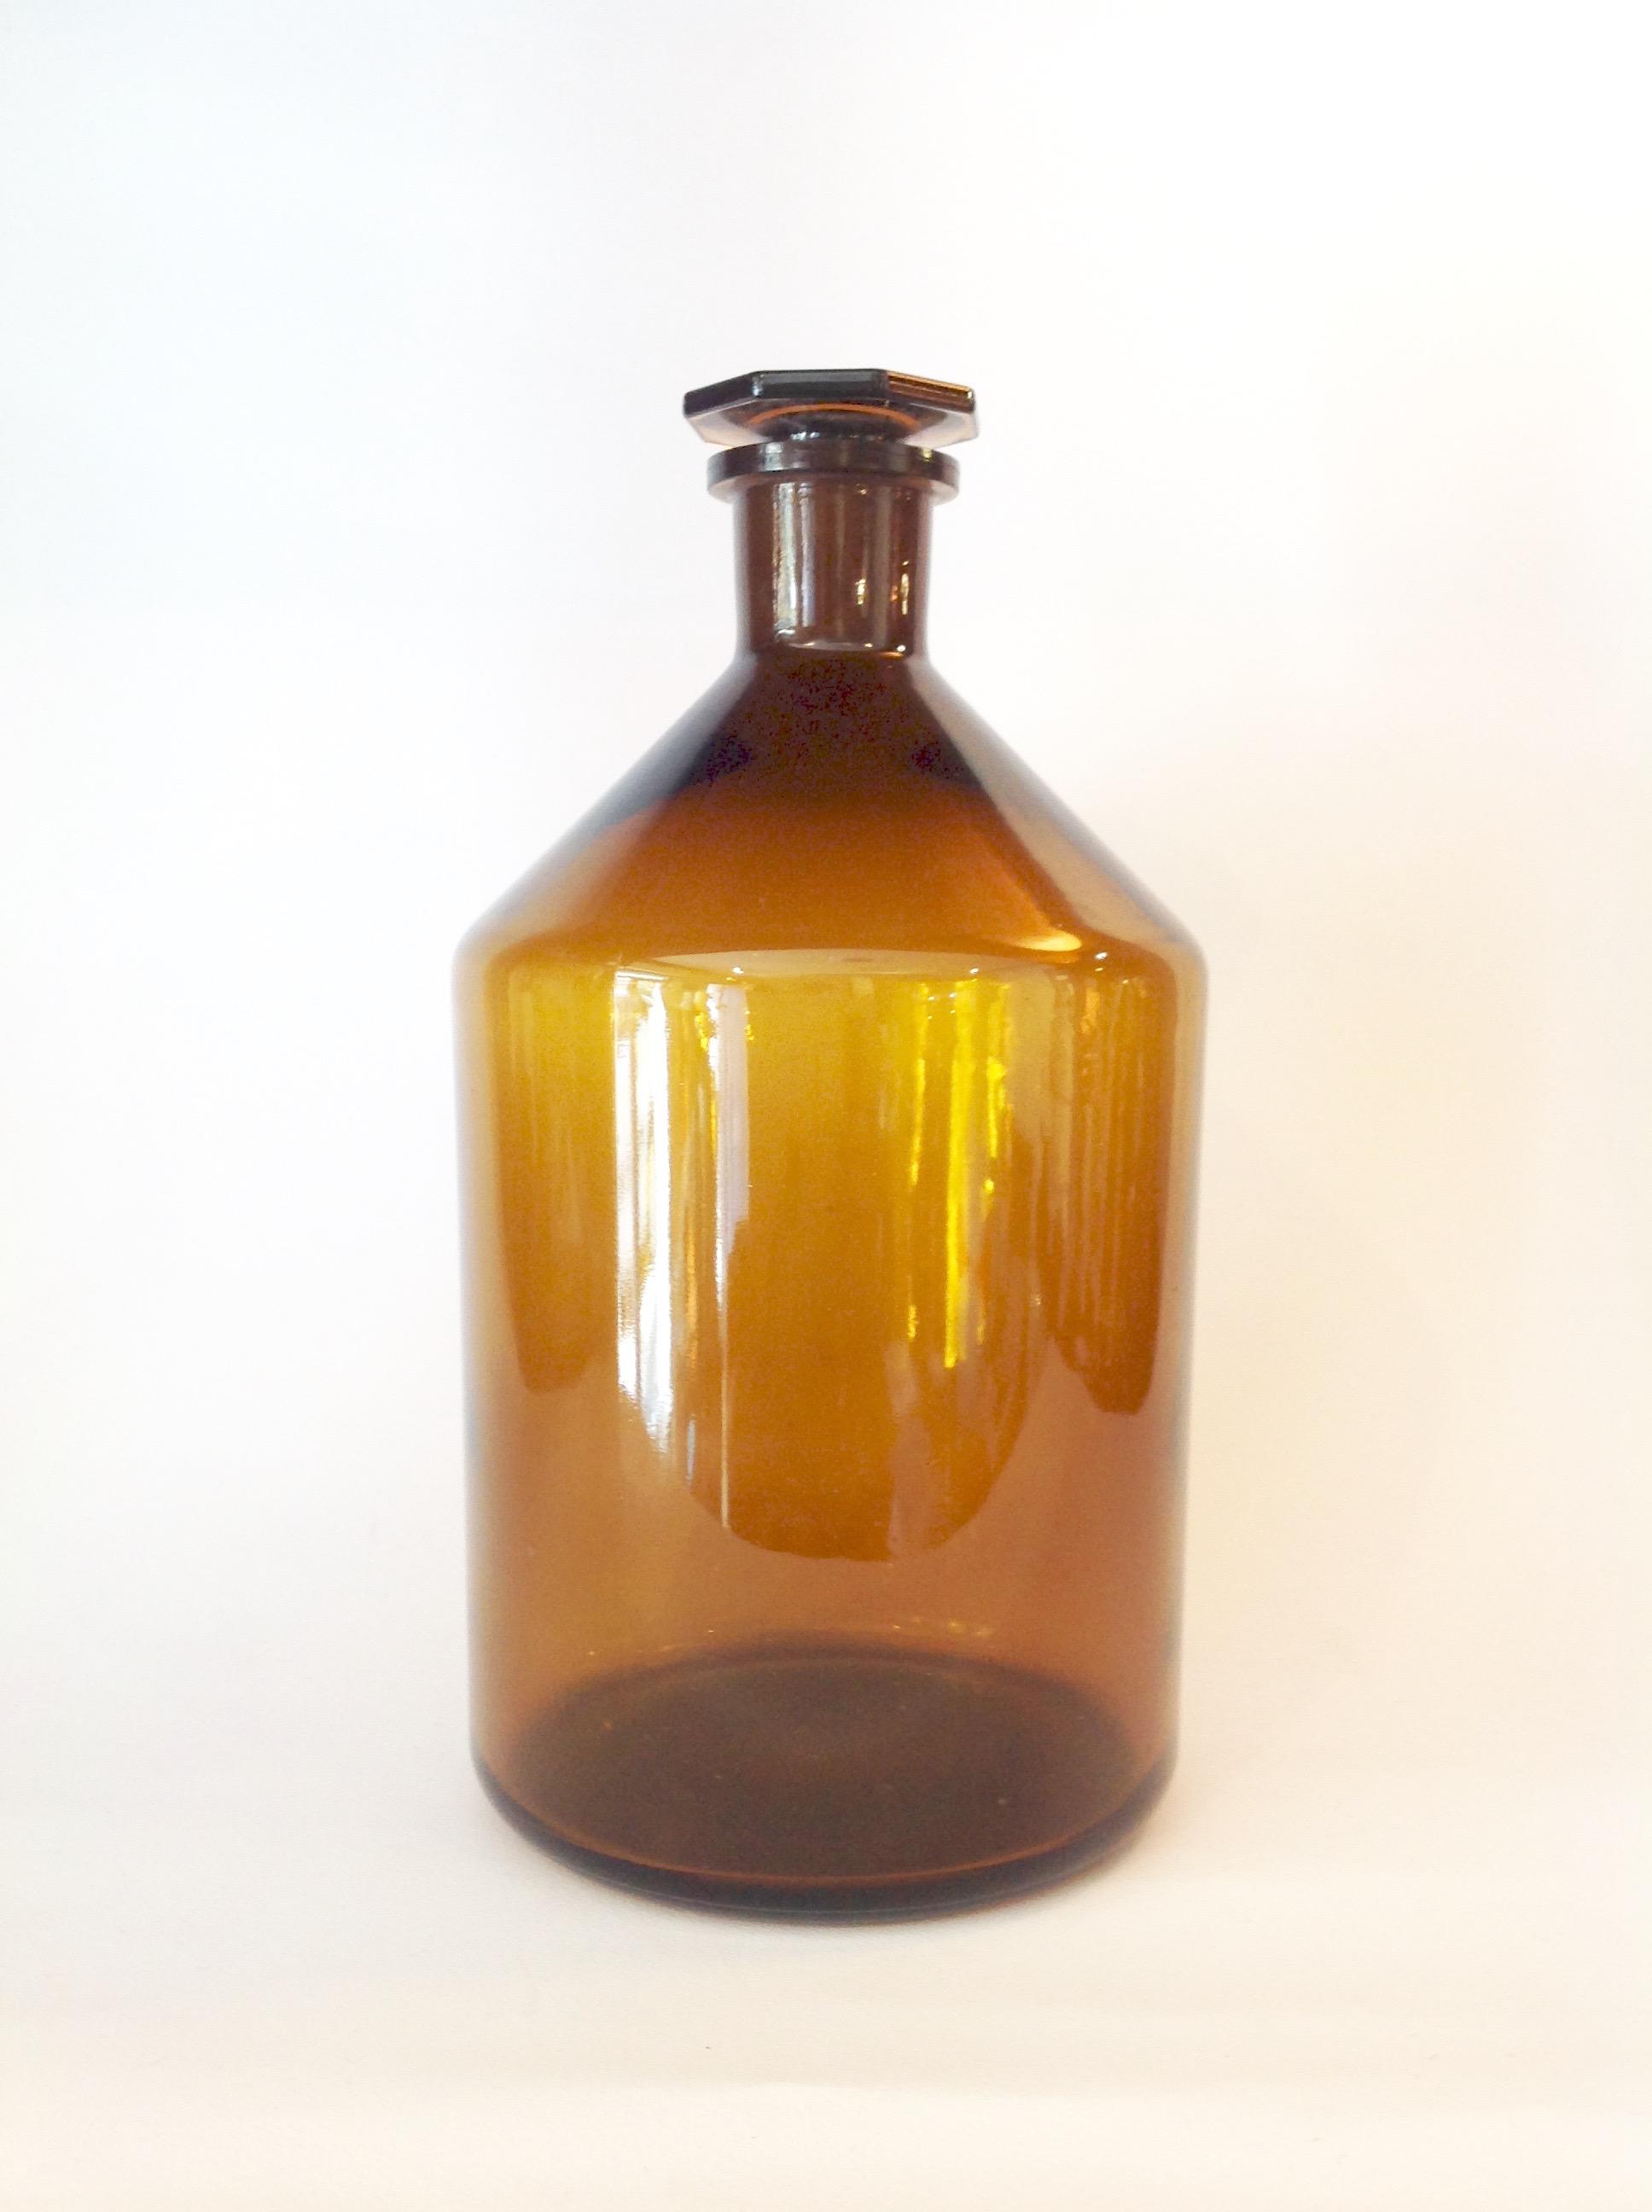 Flaconi vetro ambra tappo ottagonale ML 2000 H. 26 cm diametro 15 cm